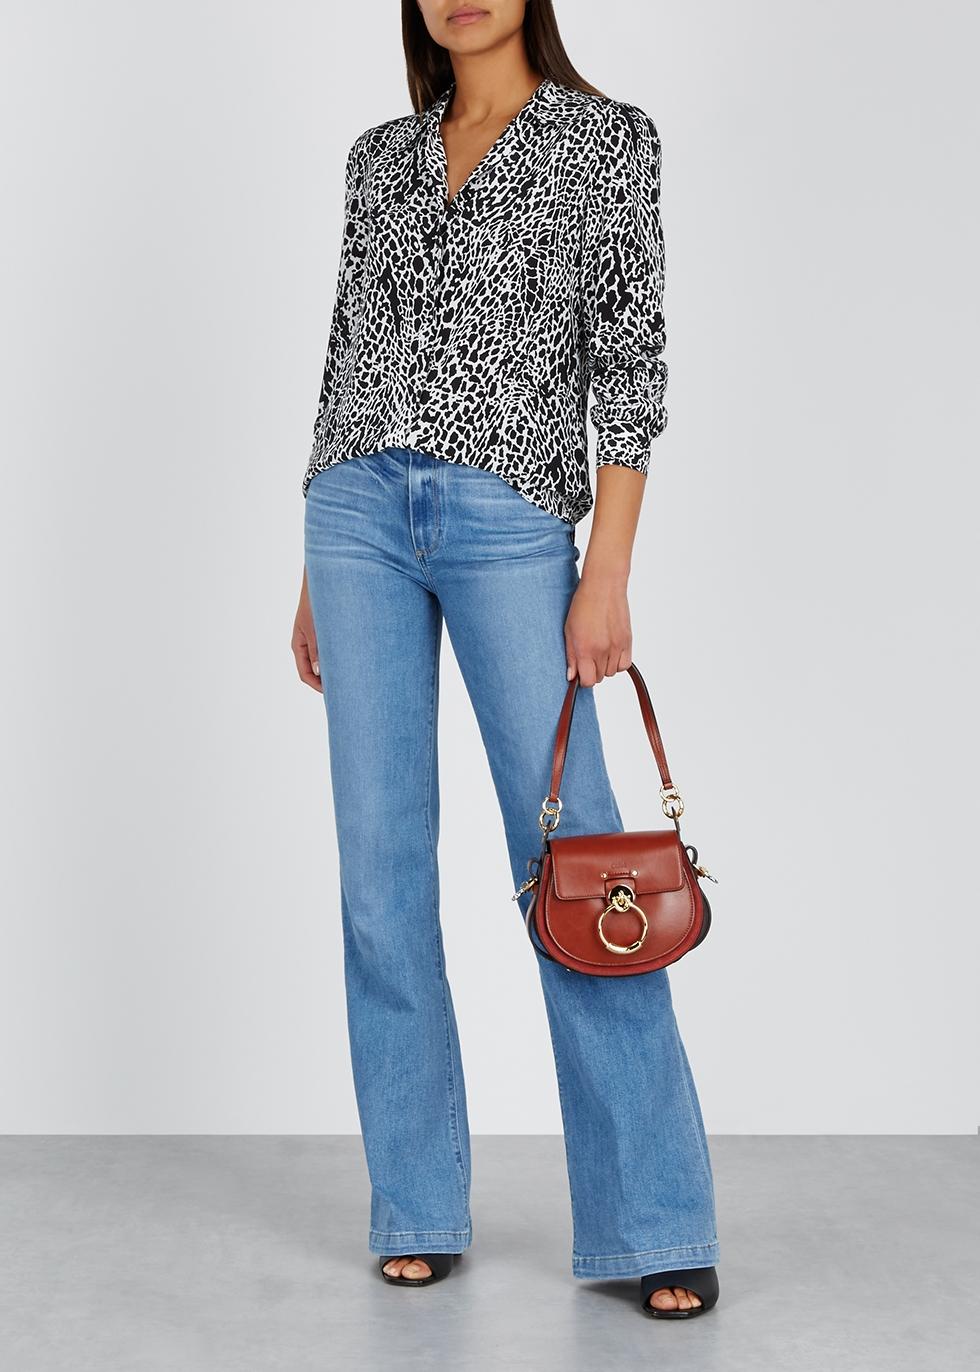 Genevive light blue flared jeans - Paige